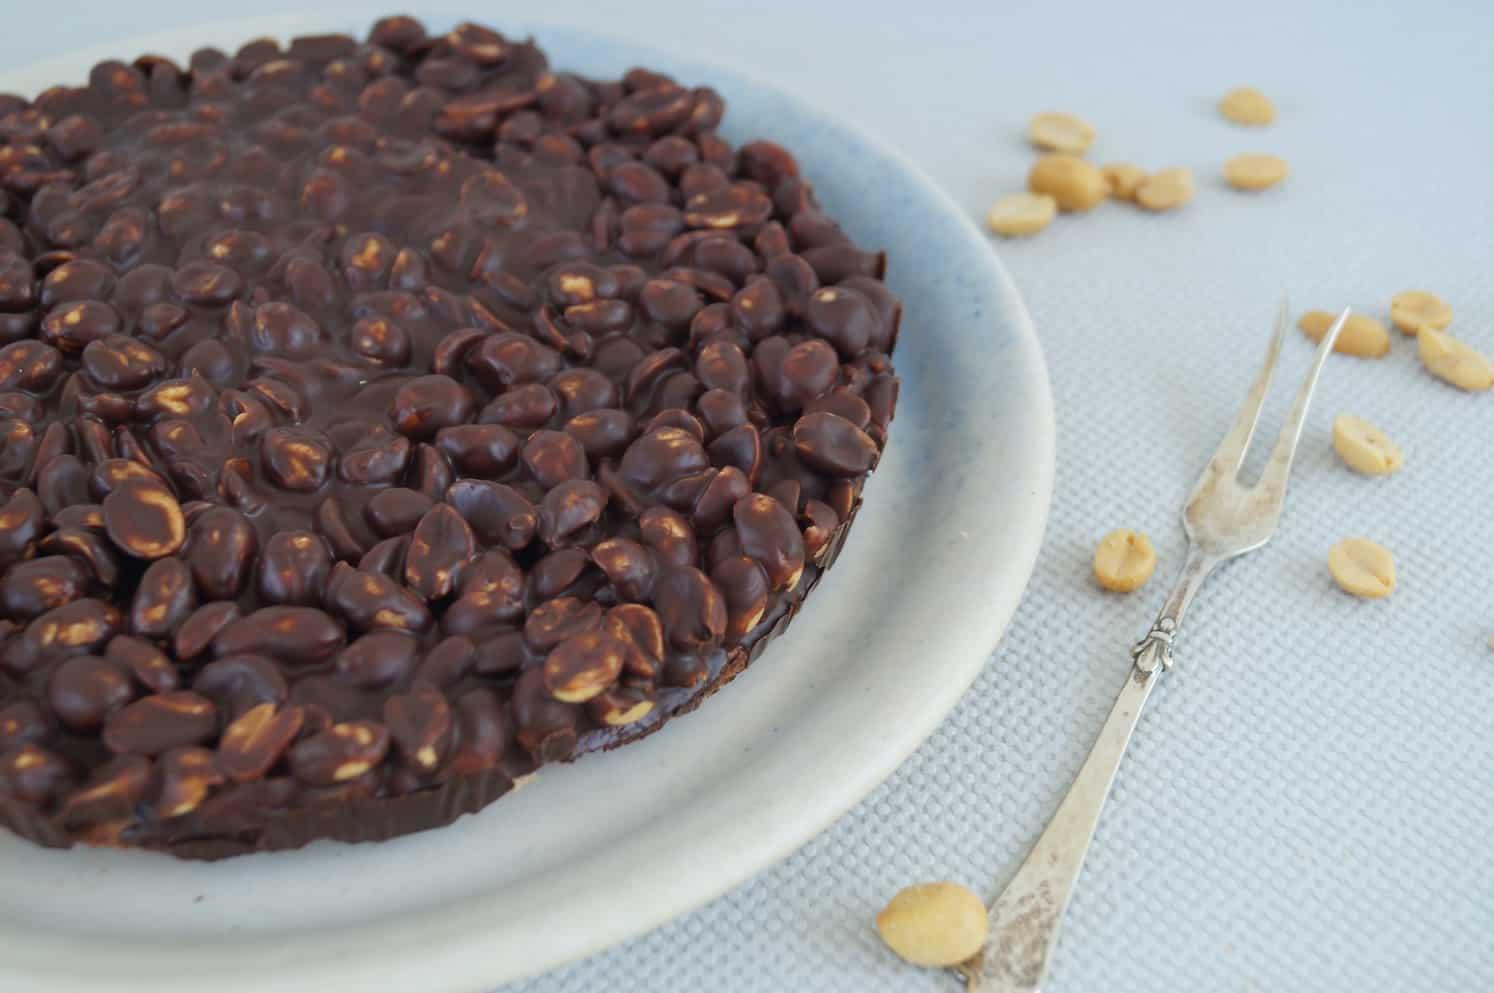 Sund snickerskage uden gluten og raffineret sukker